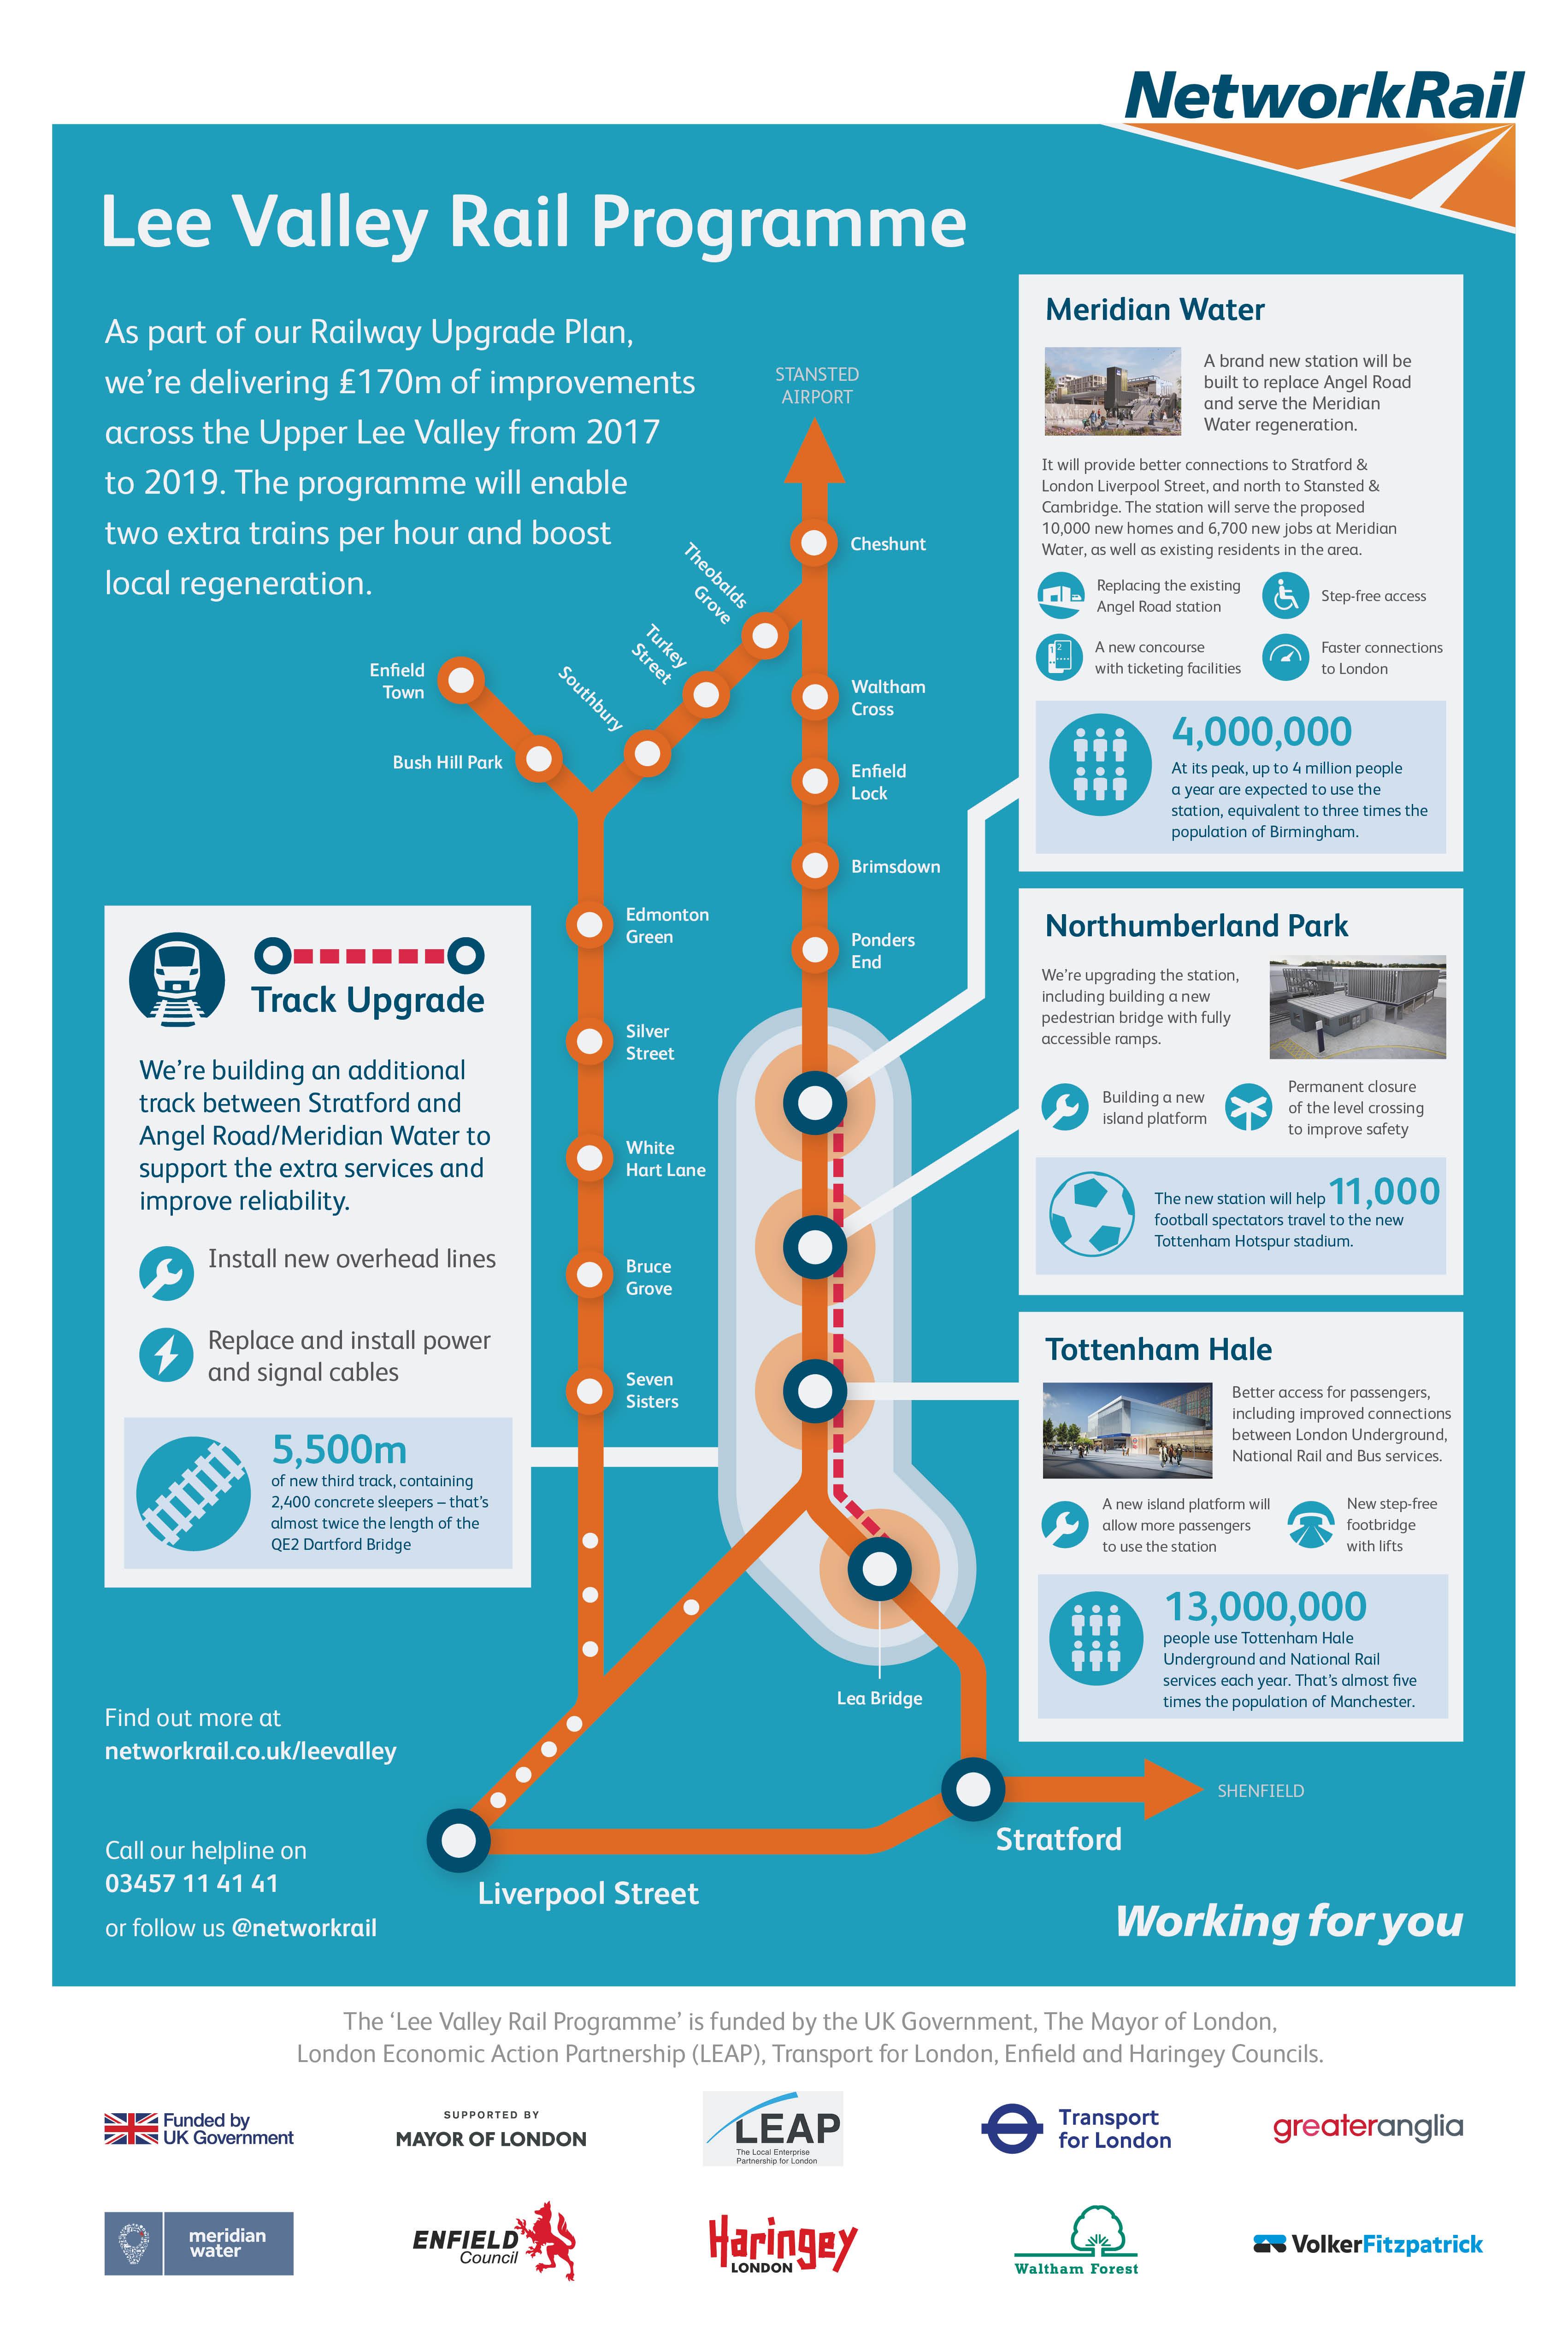 Lee Valley Rail programme info-map